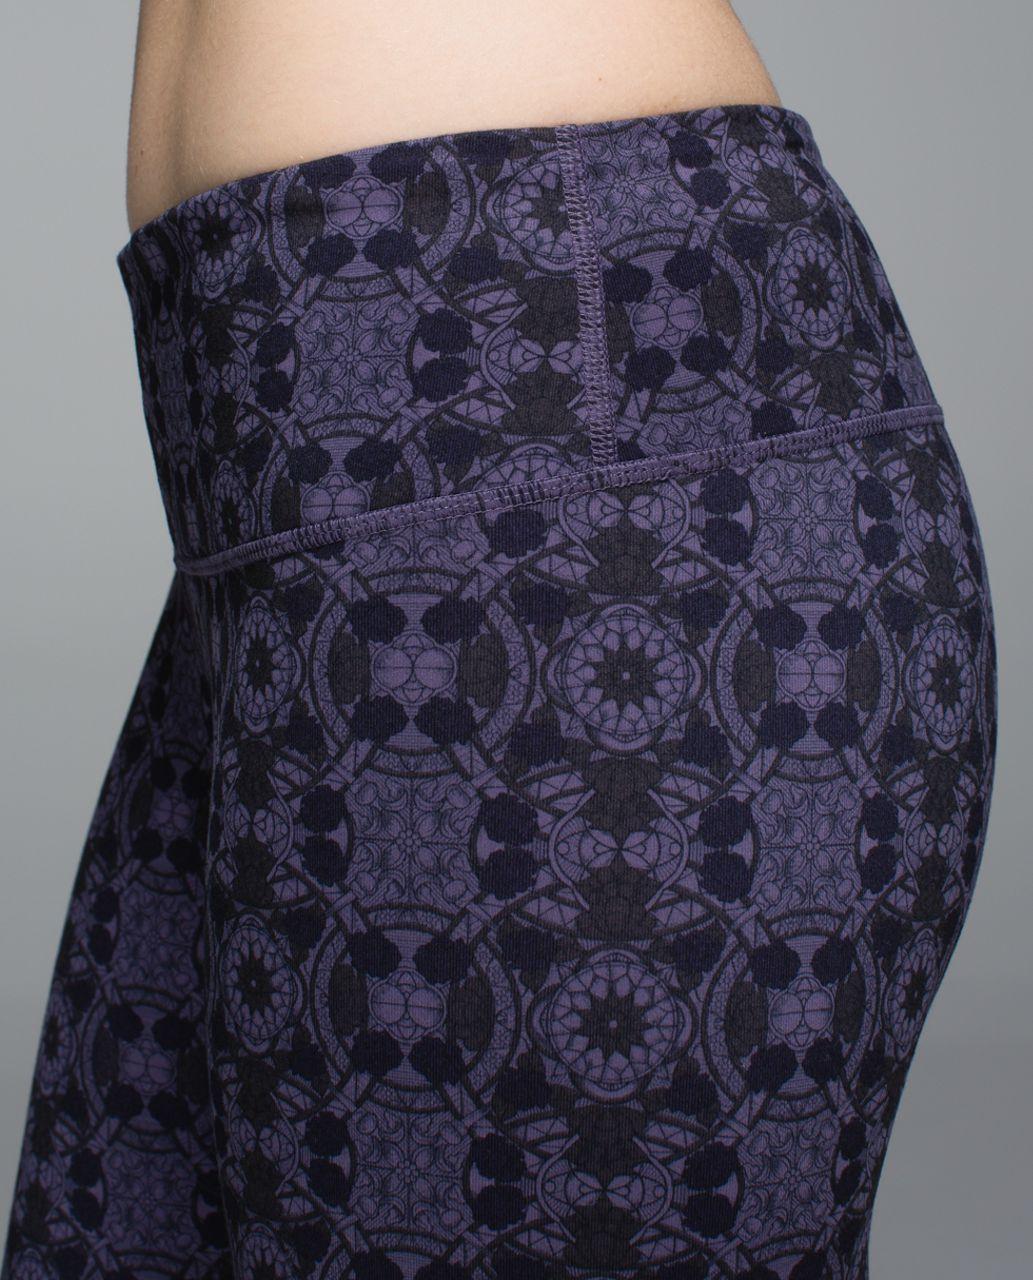 Lululemon Wunder Under Pant *Full-On Luon - Mini Prisma Nightfall Black Grape